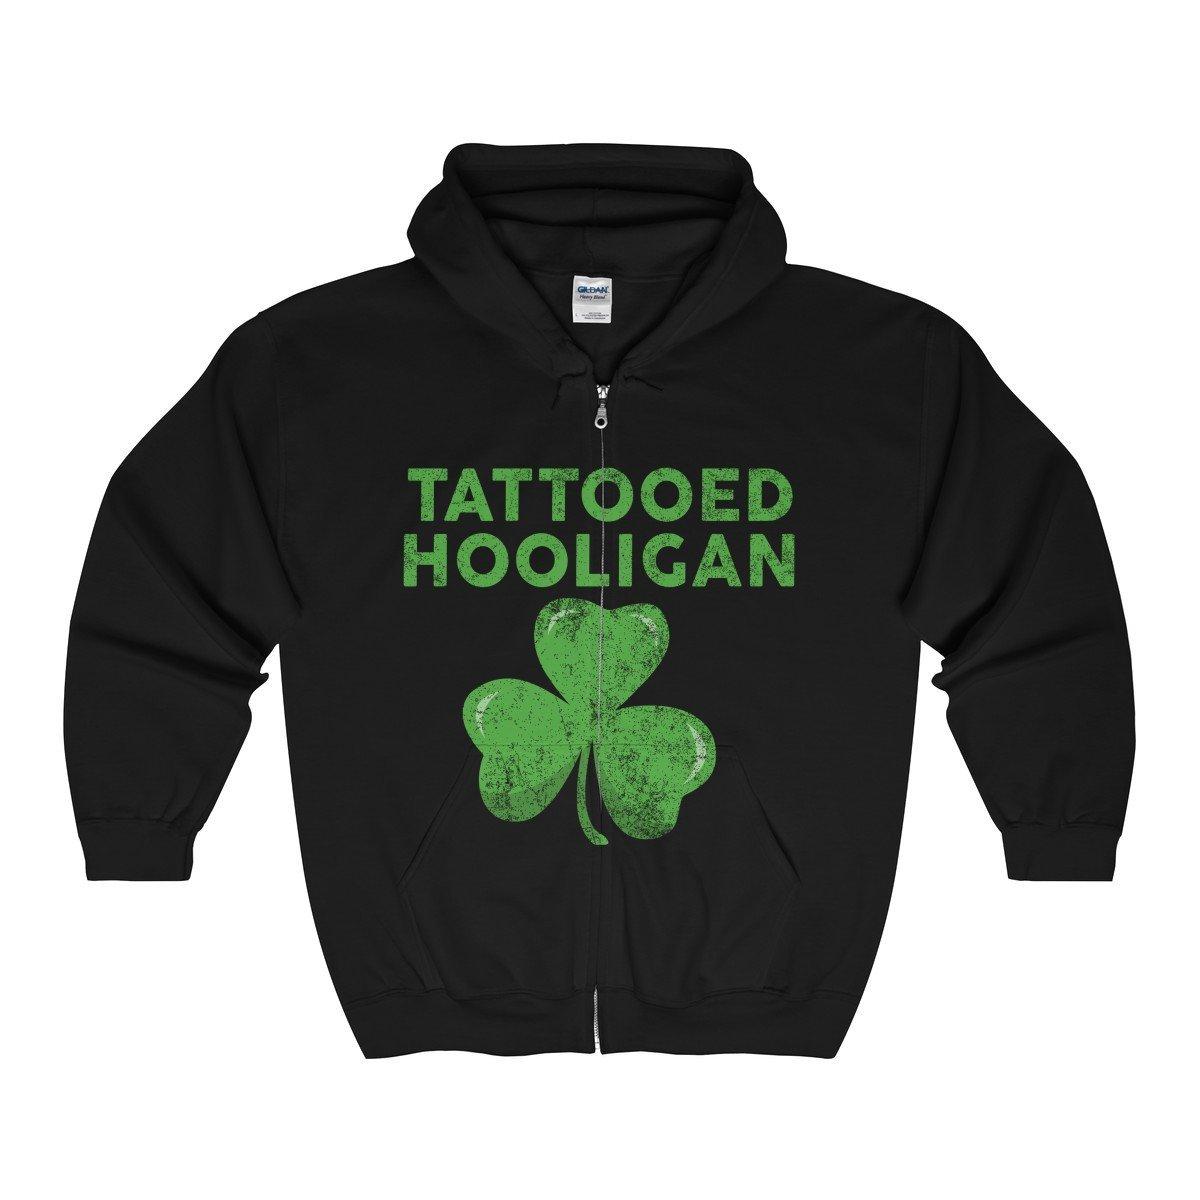 Vinteena ST Patricks Day Shirt Shamrock Clover Paddy Irish Unisex Men Unisex Zip Hooded Sweatshirt-Tee